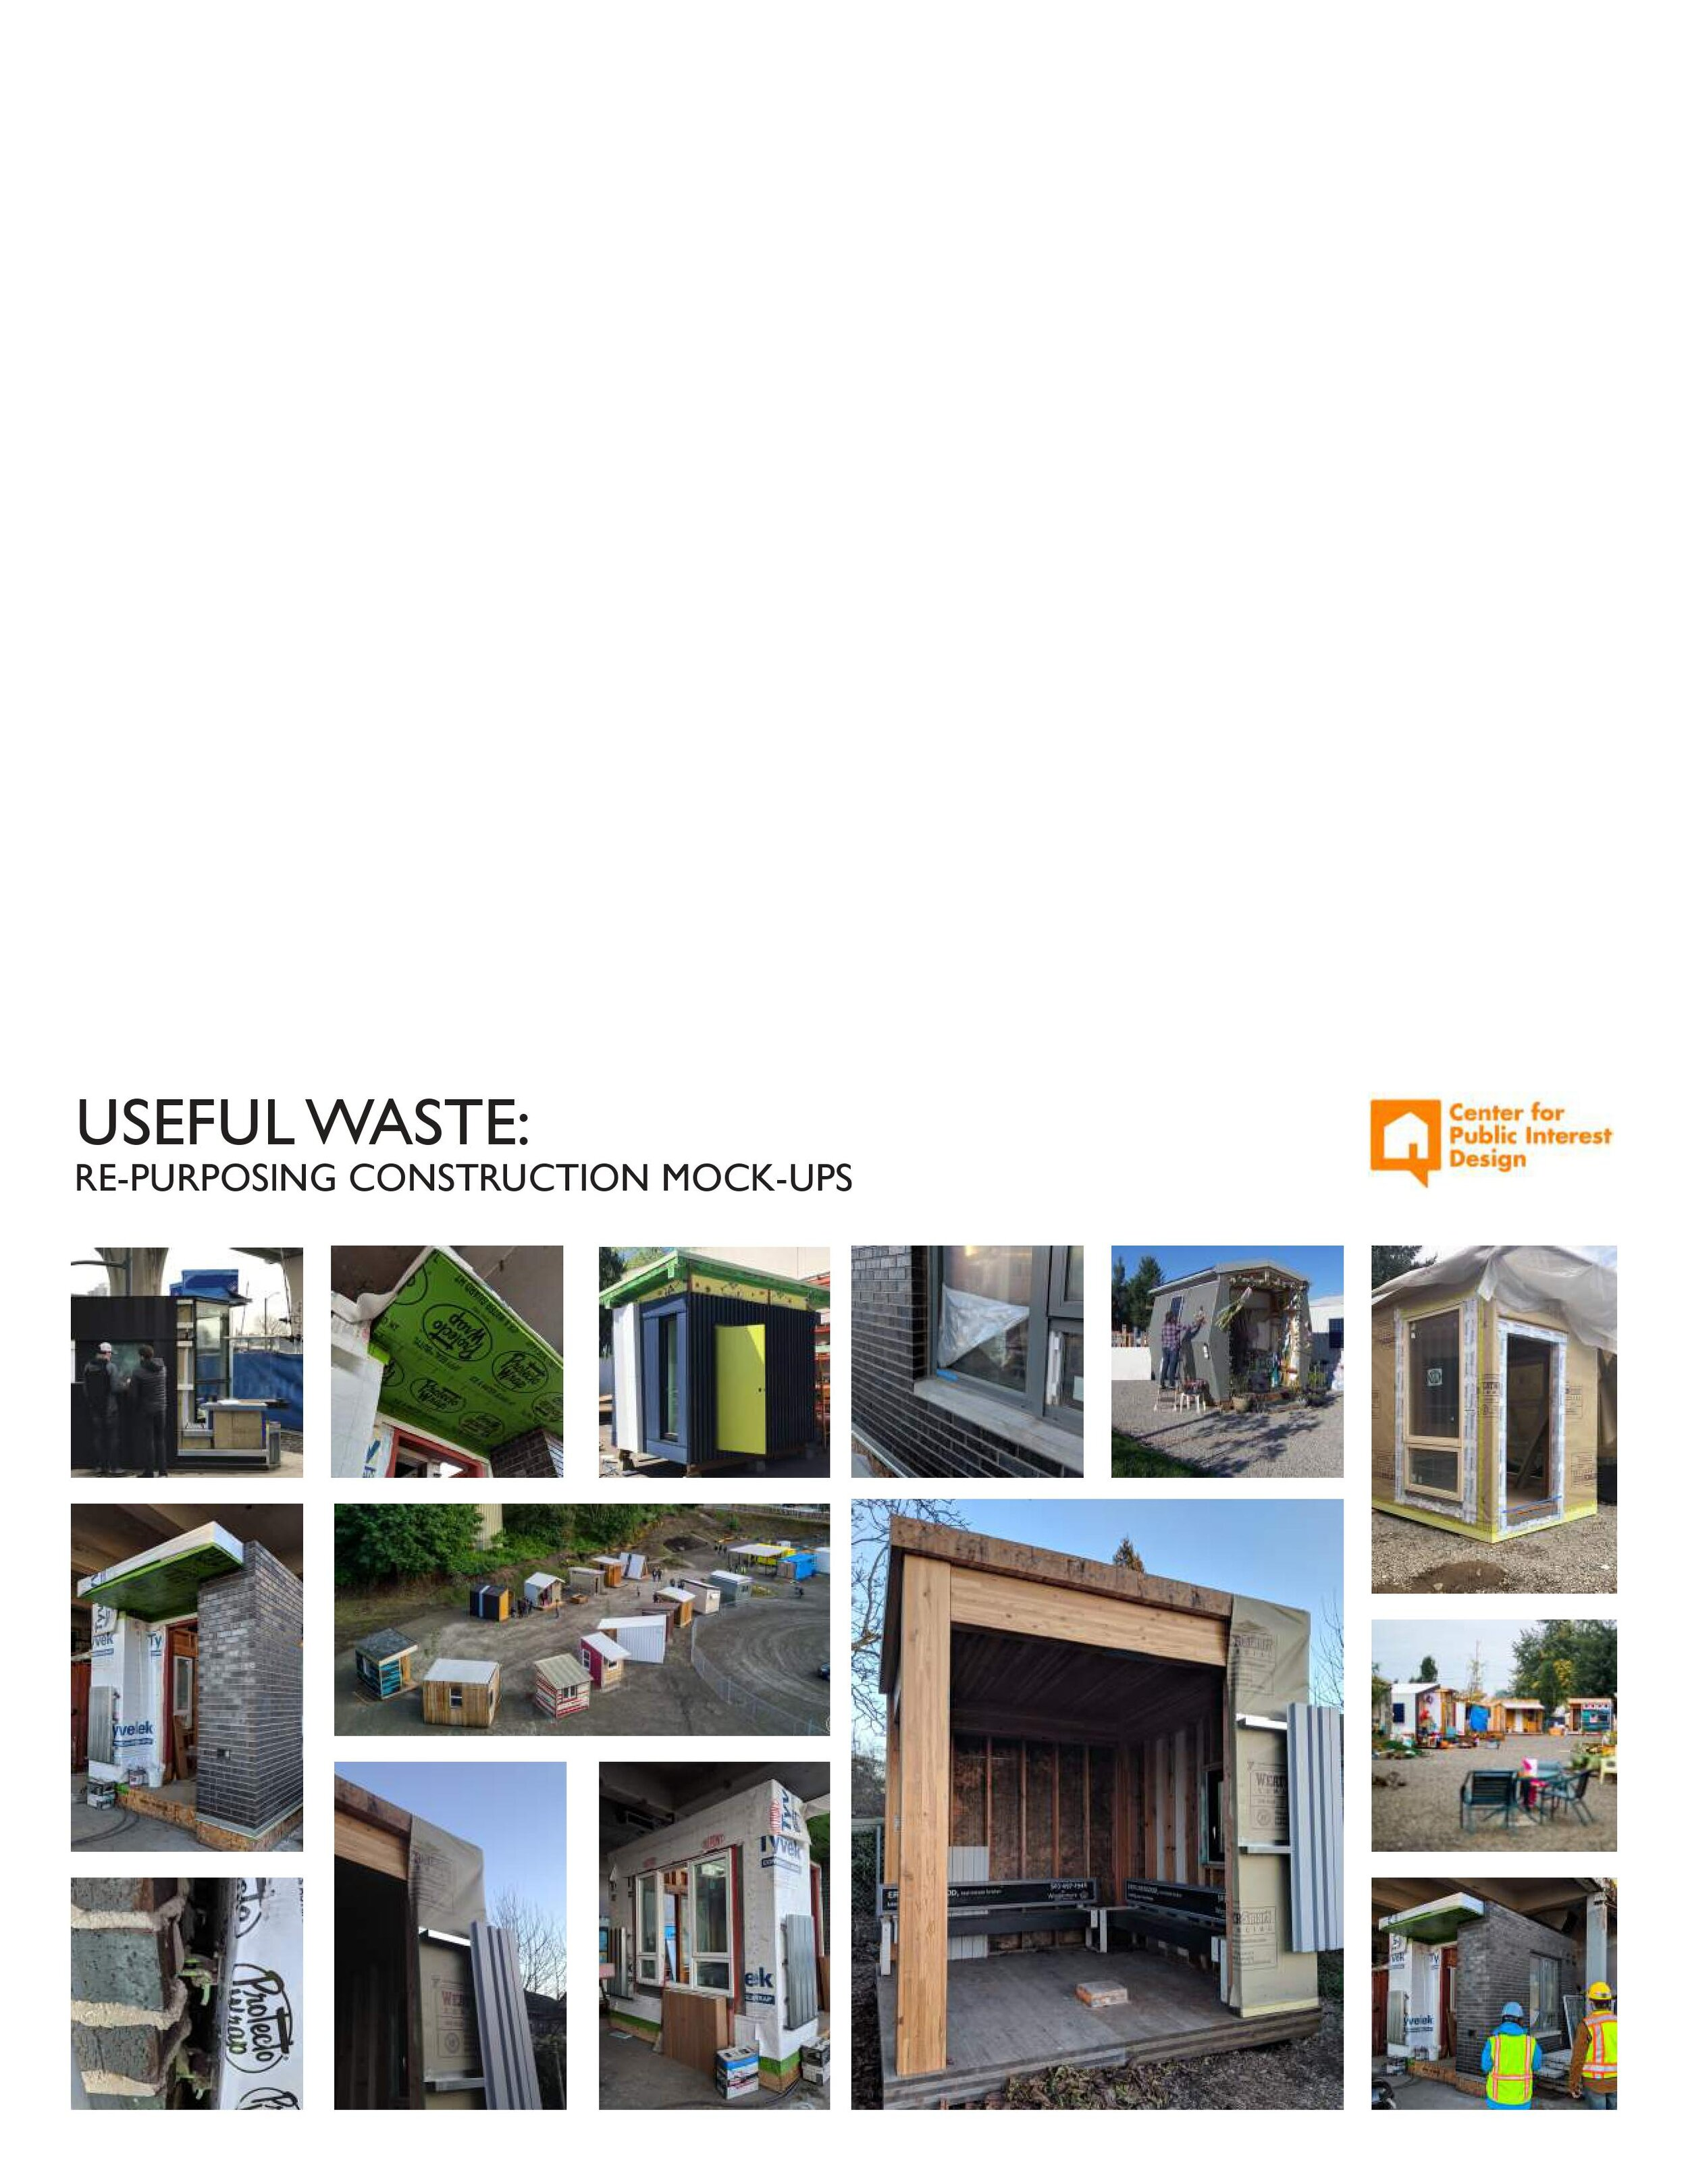 USEFUL WASTE GUIDEBOOK - RE-PURPOSING CONSTRUCTION MOCK-UPS